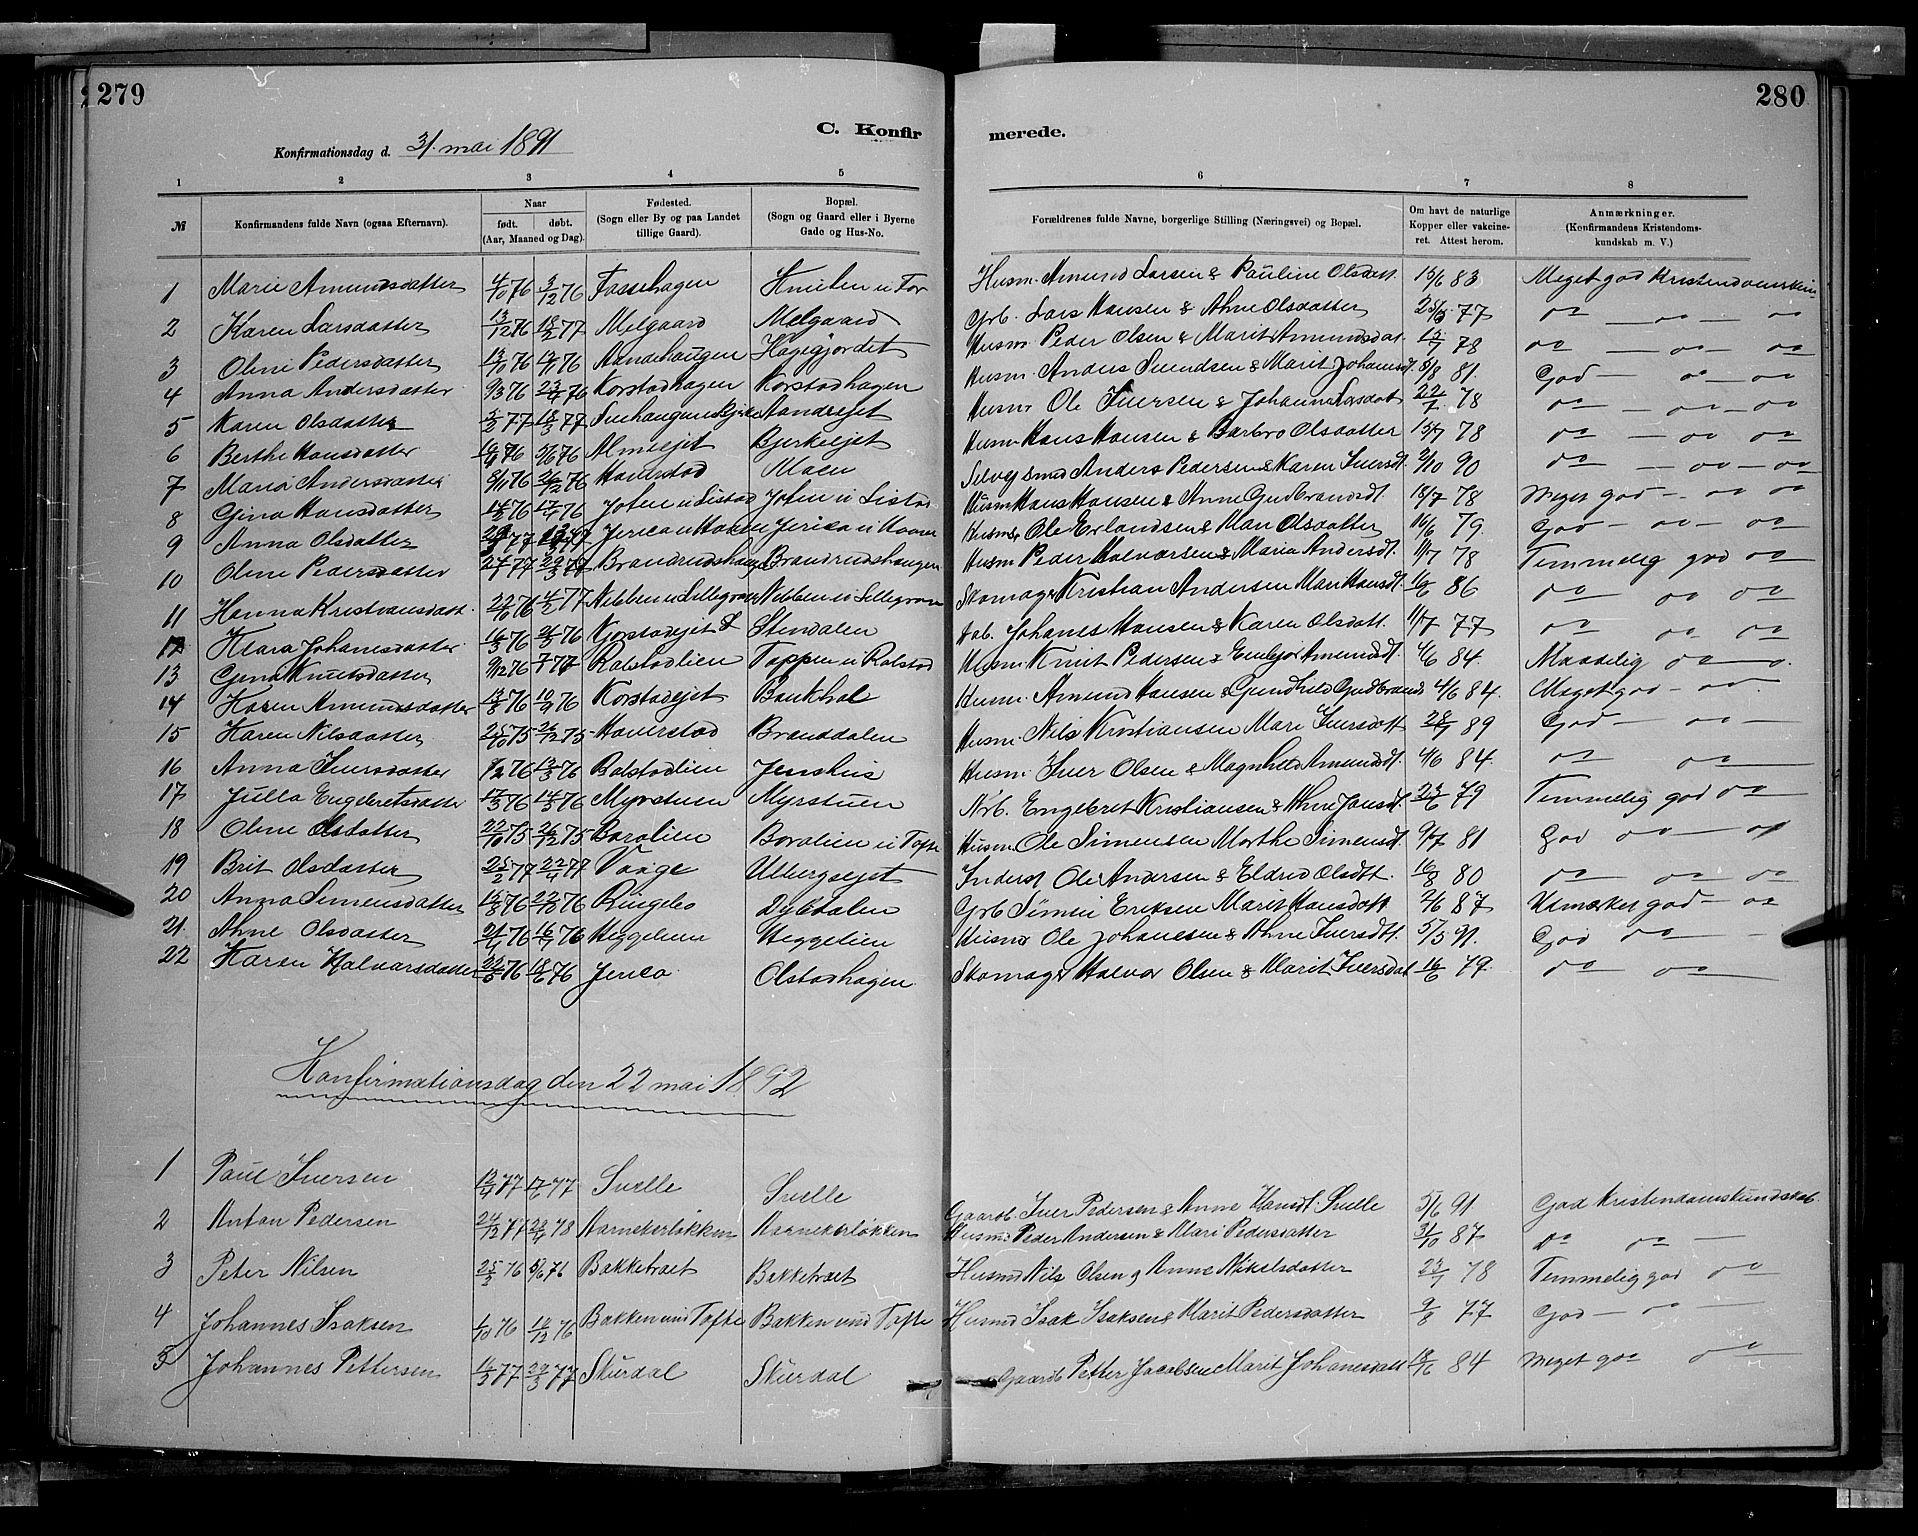 SAH, Sør-Fron prestekontor, H/Ha/Hab/L0003: Klokkerbok nr. 3, 1884-1896, s. 279-280